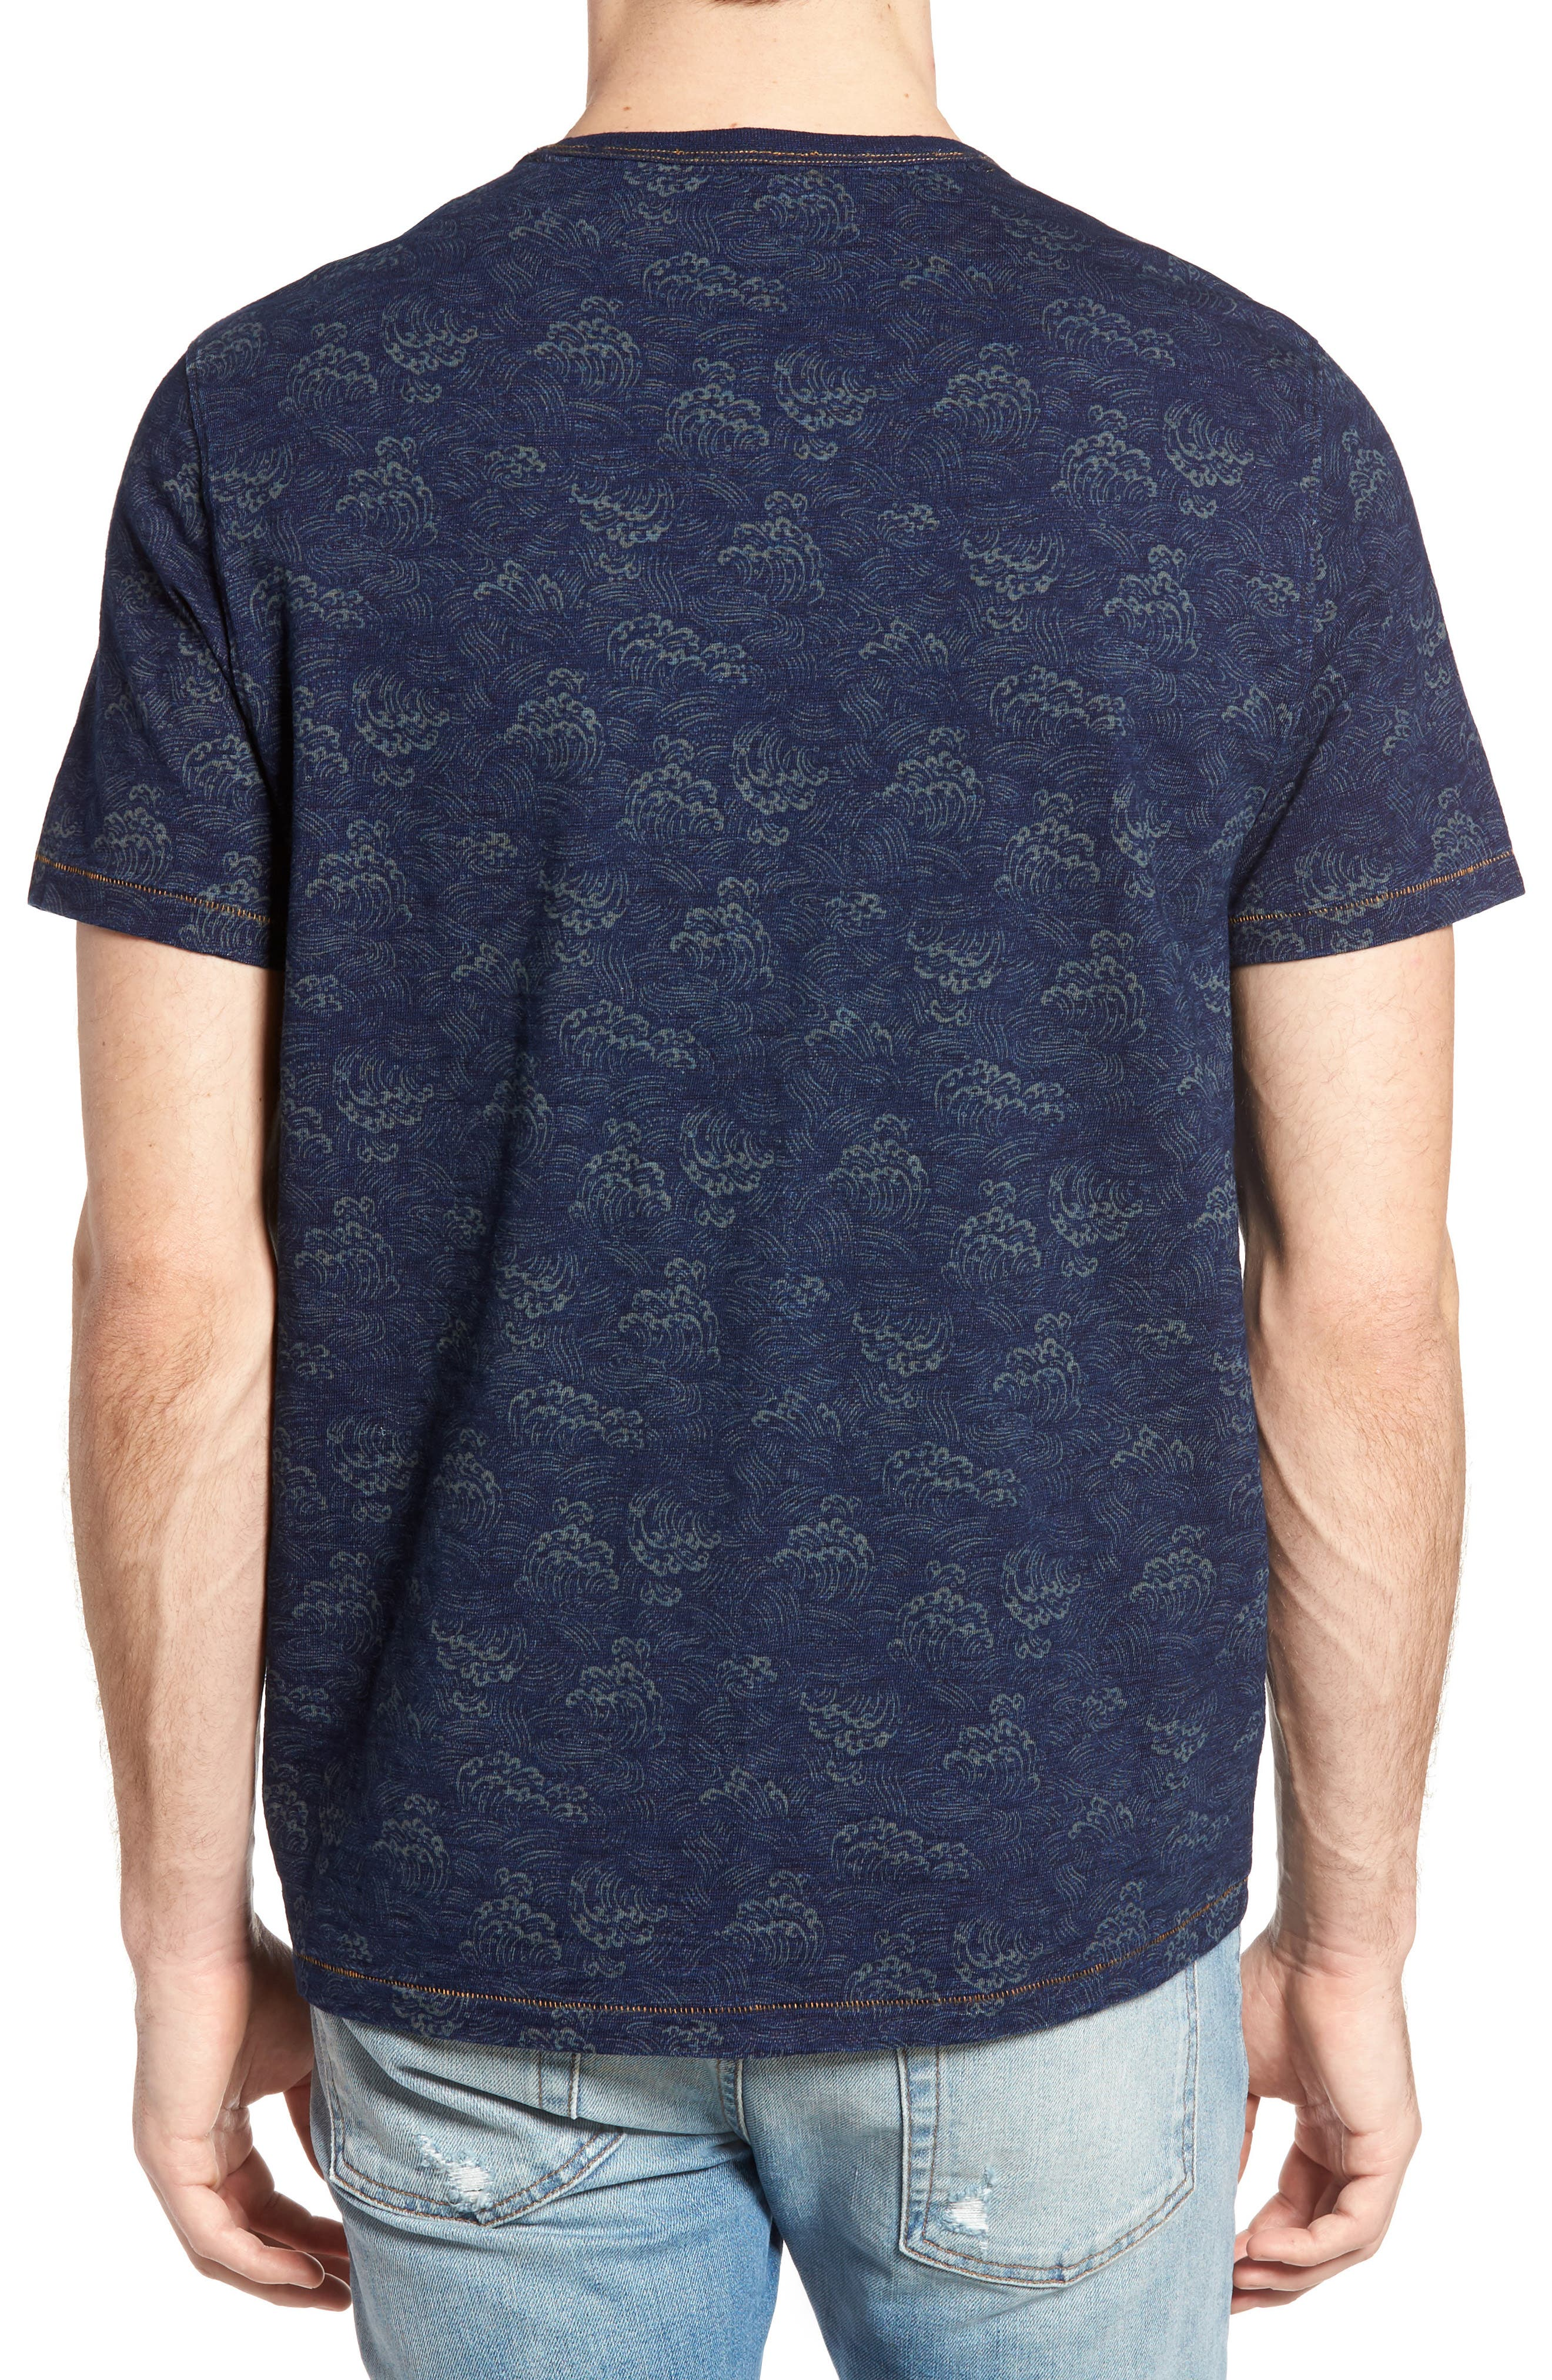 Swell Print Indigo Slub Jersey T-Shirt,                             Alternate thumbnail 2, color,                             Admiral